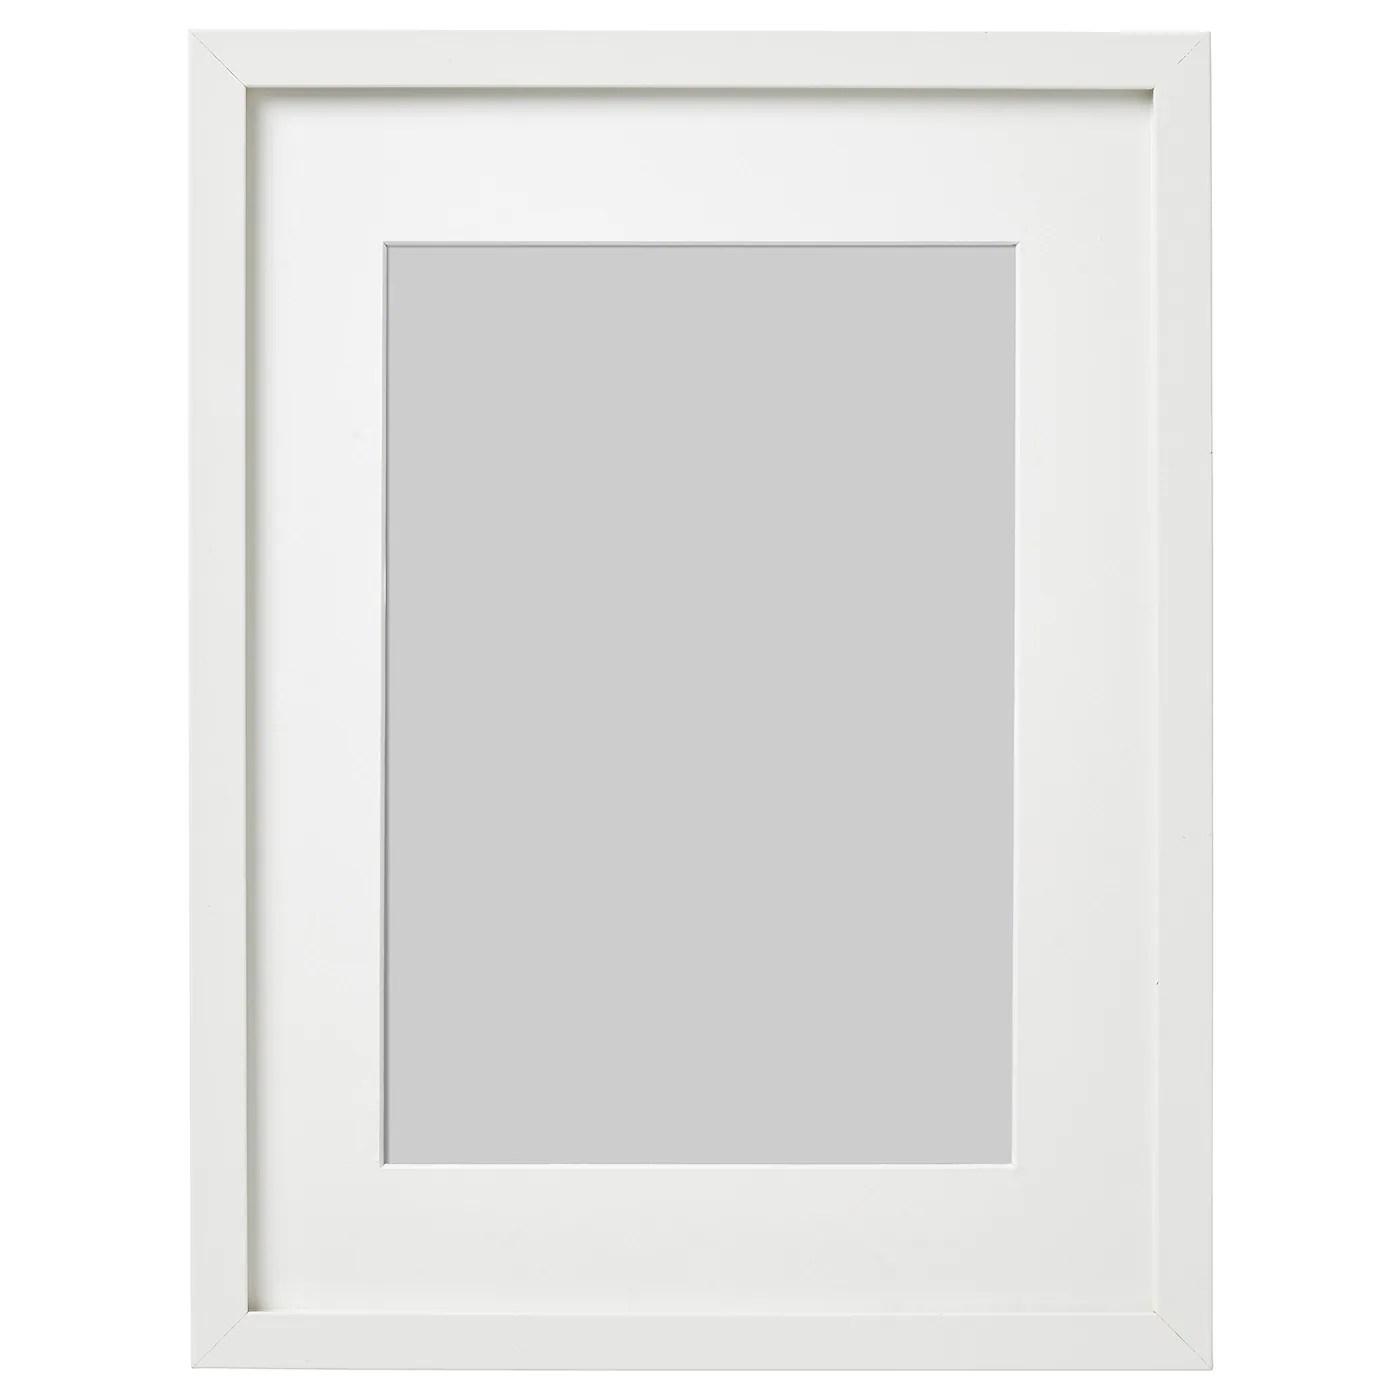 ribba frame white 12x16